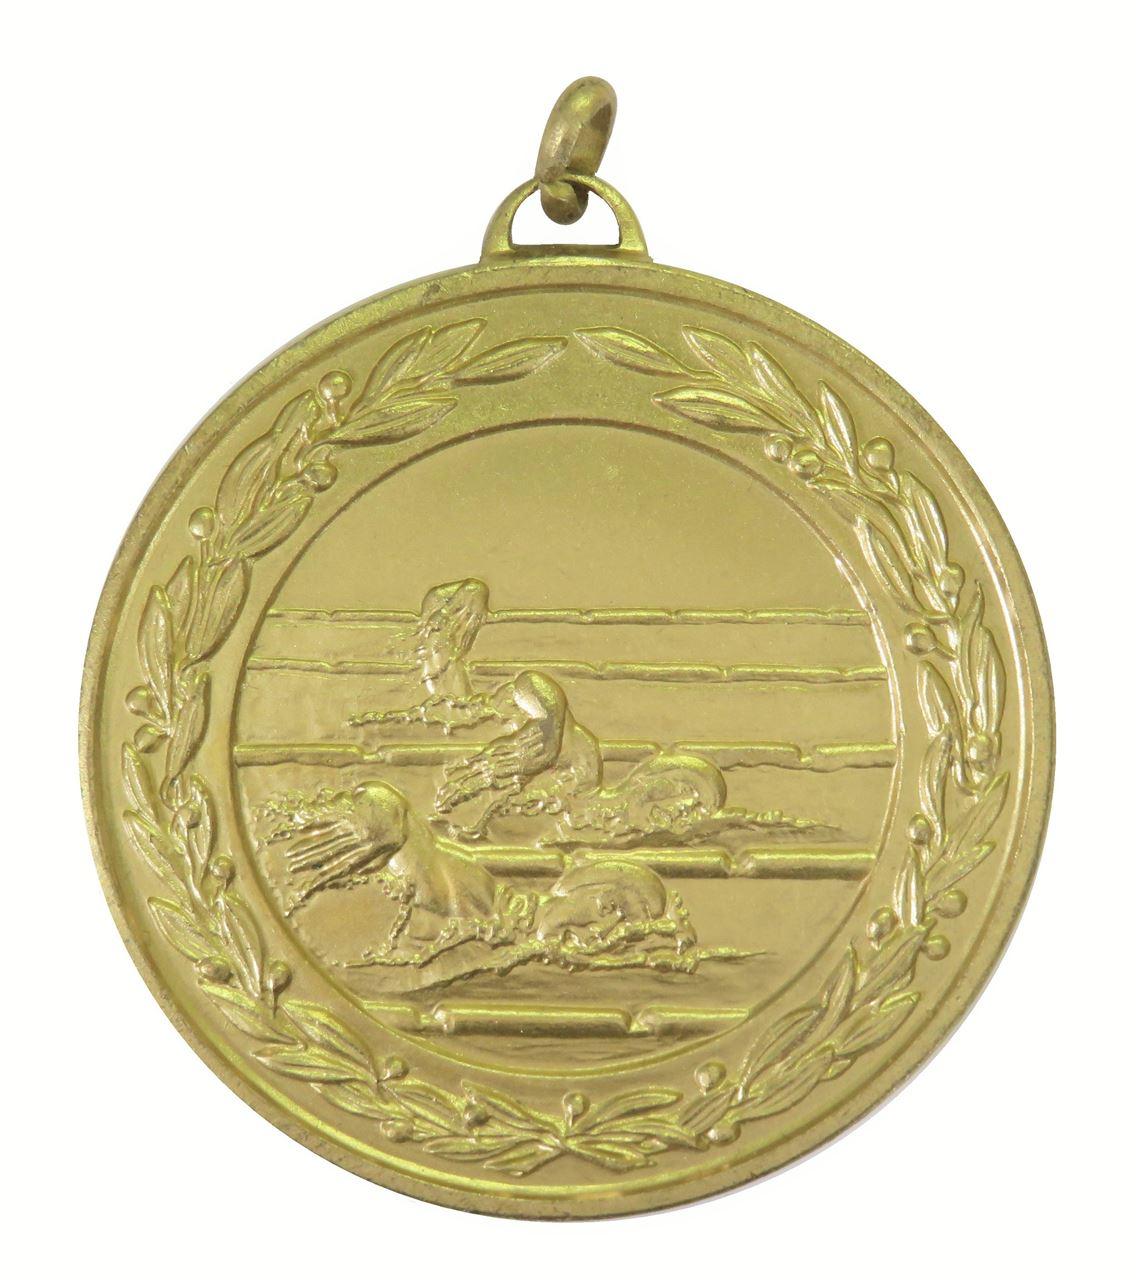 Gold Laurel Economy Female Swimmers Medal (size: 50mm) - 9703E